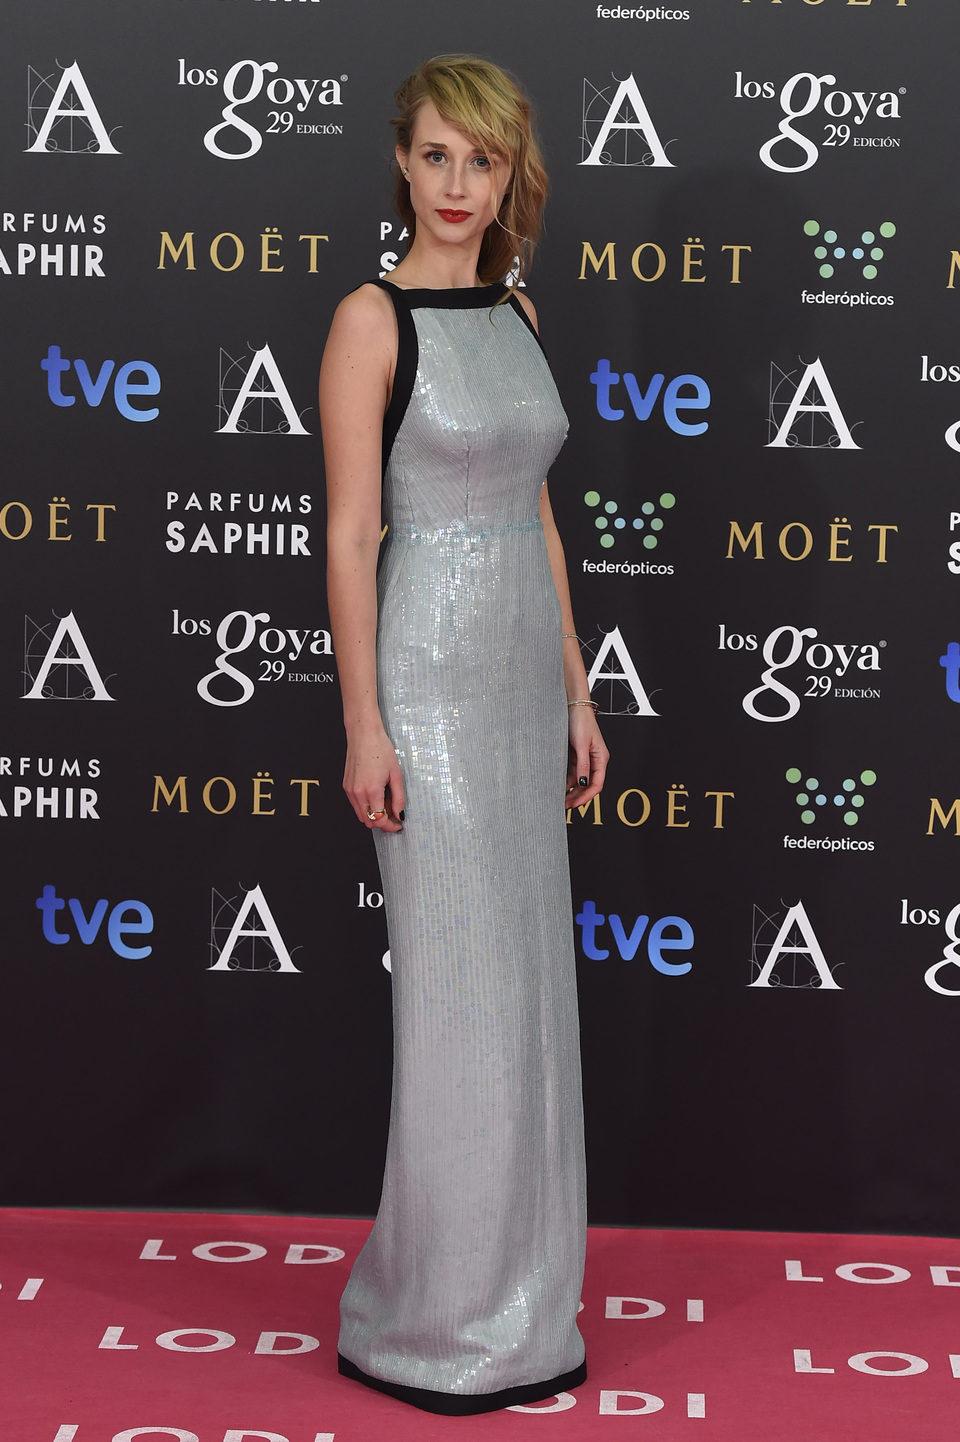 Ingrid García Jonsson en los Goya 2015